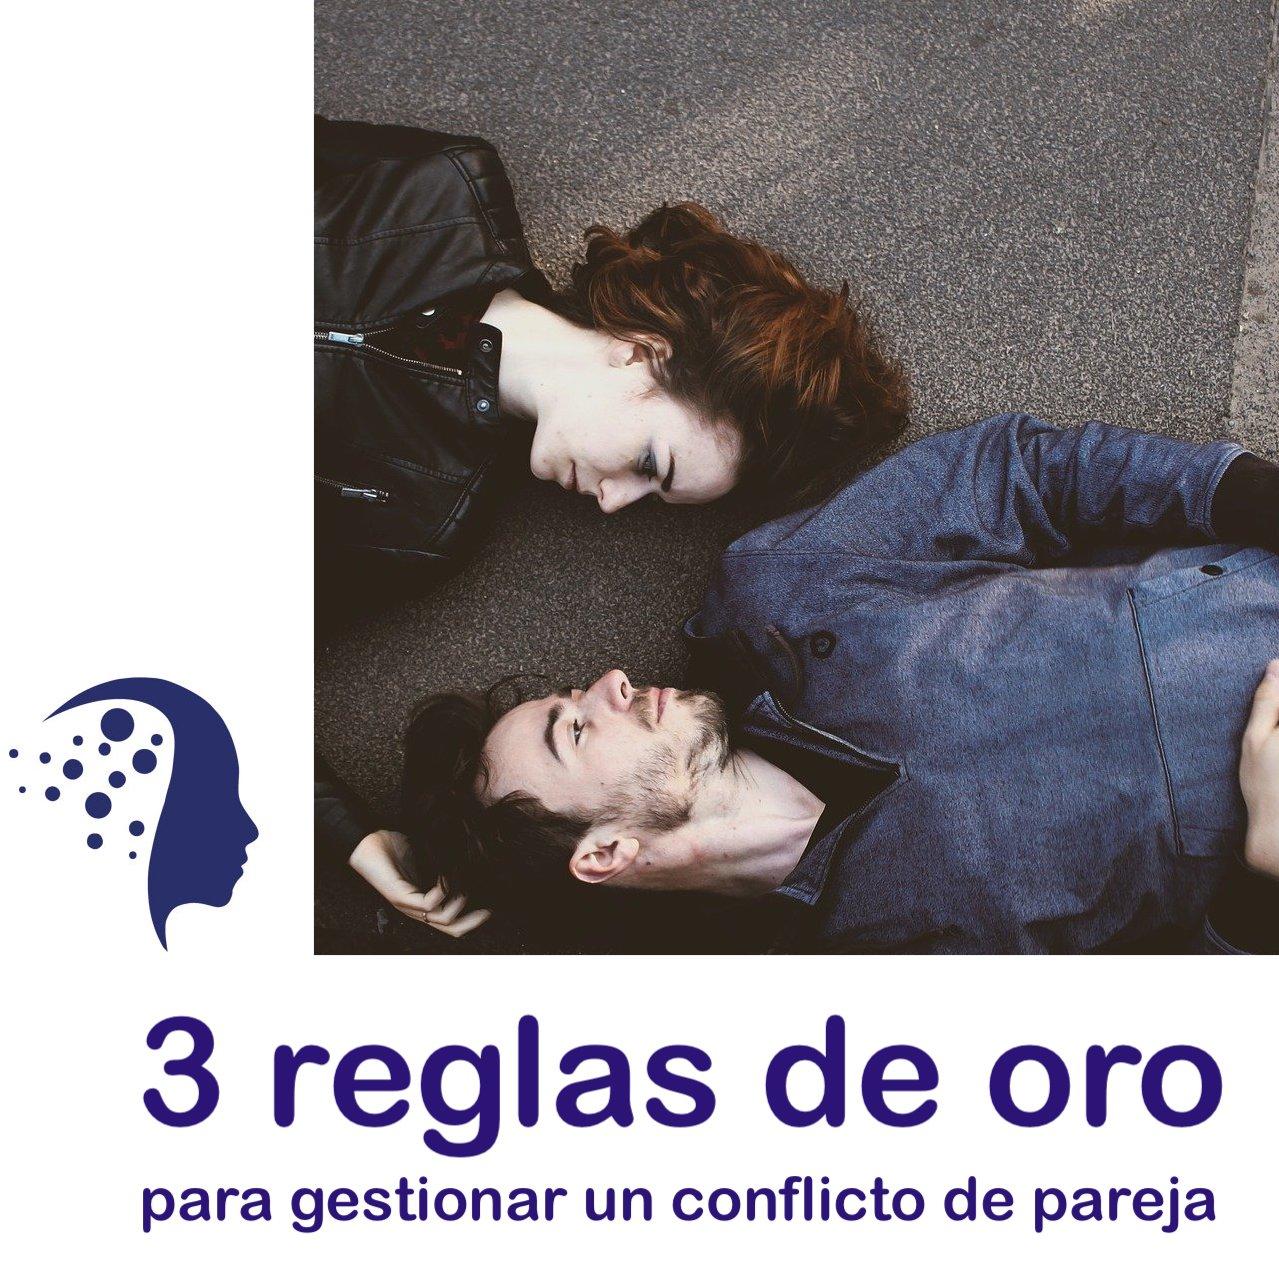 sara-navarrete-psicologa-valencia-centro-pareja - Psicólogo en Valencia